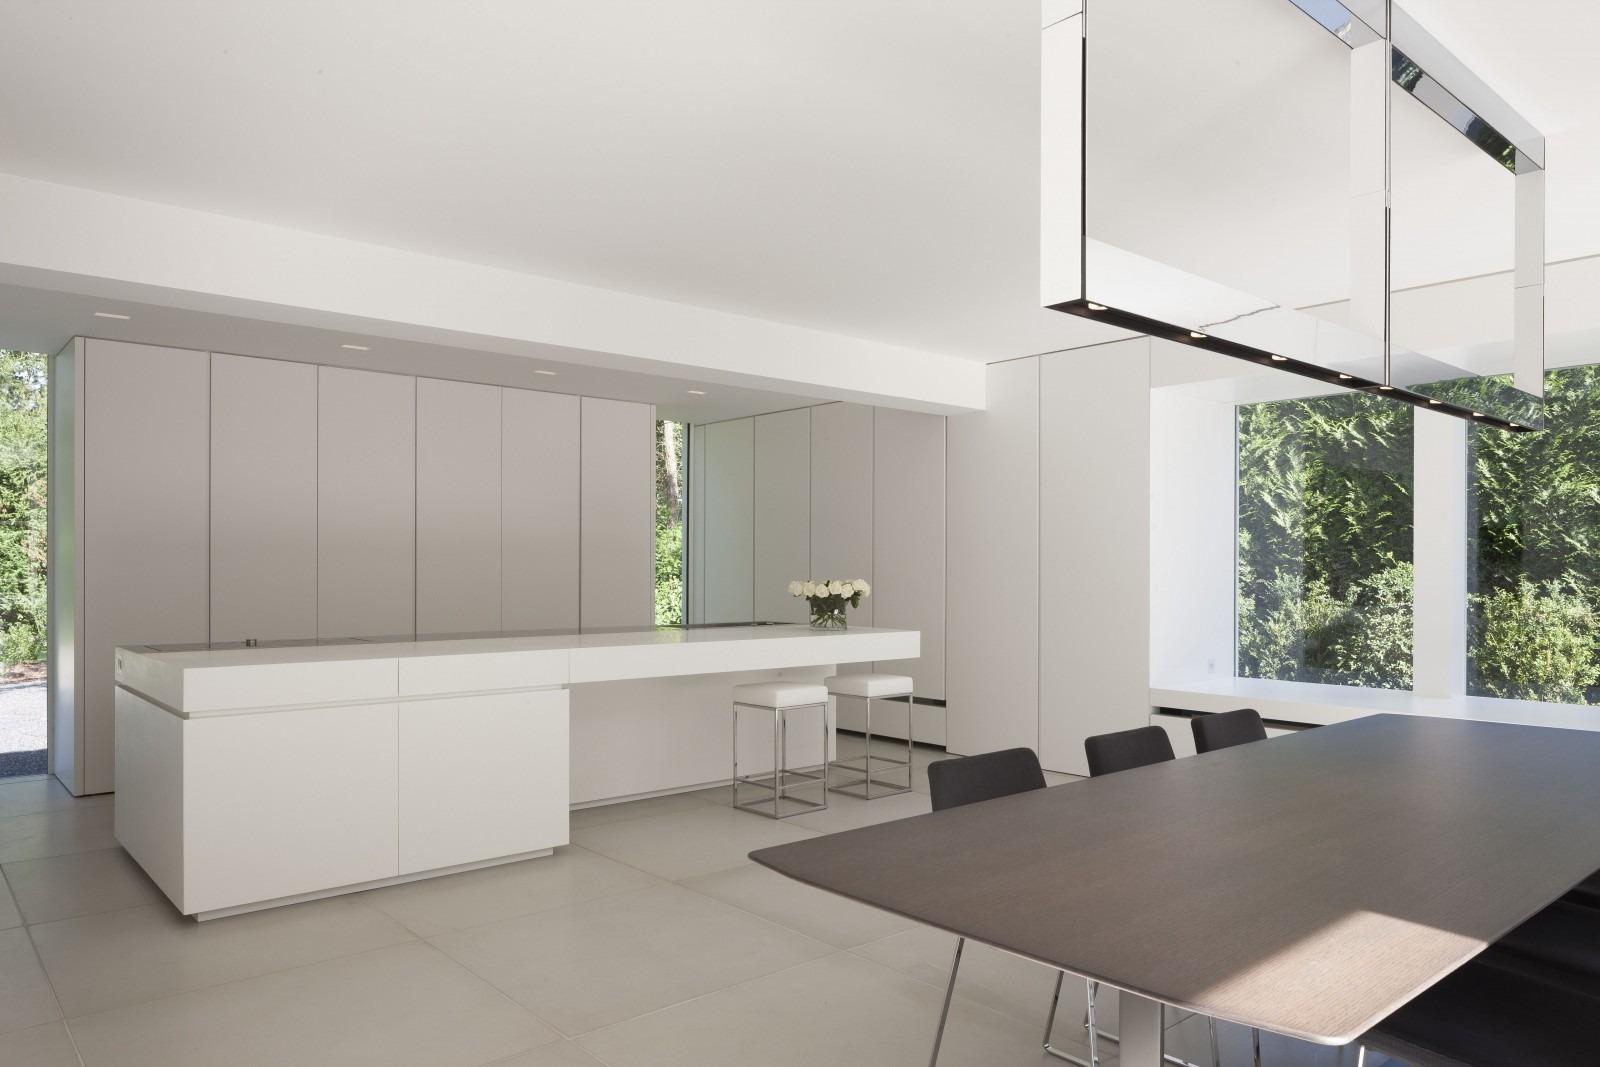 Tegels 100x100 Prijs : Betonnen vloertegels interieur exterieur betonal